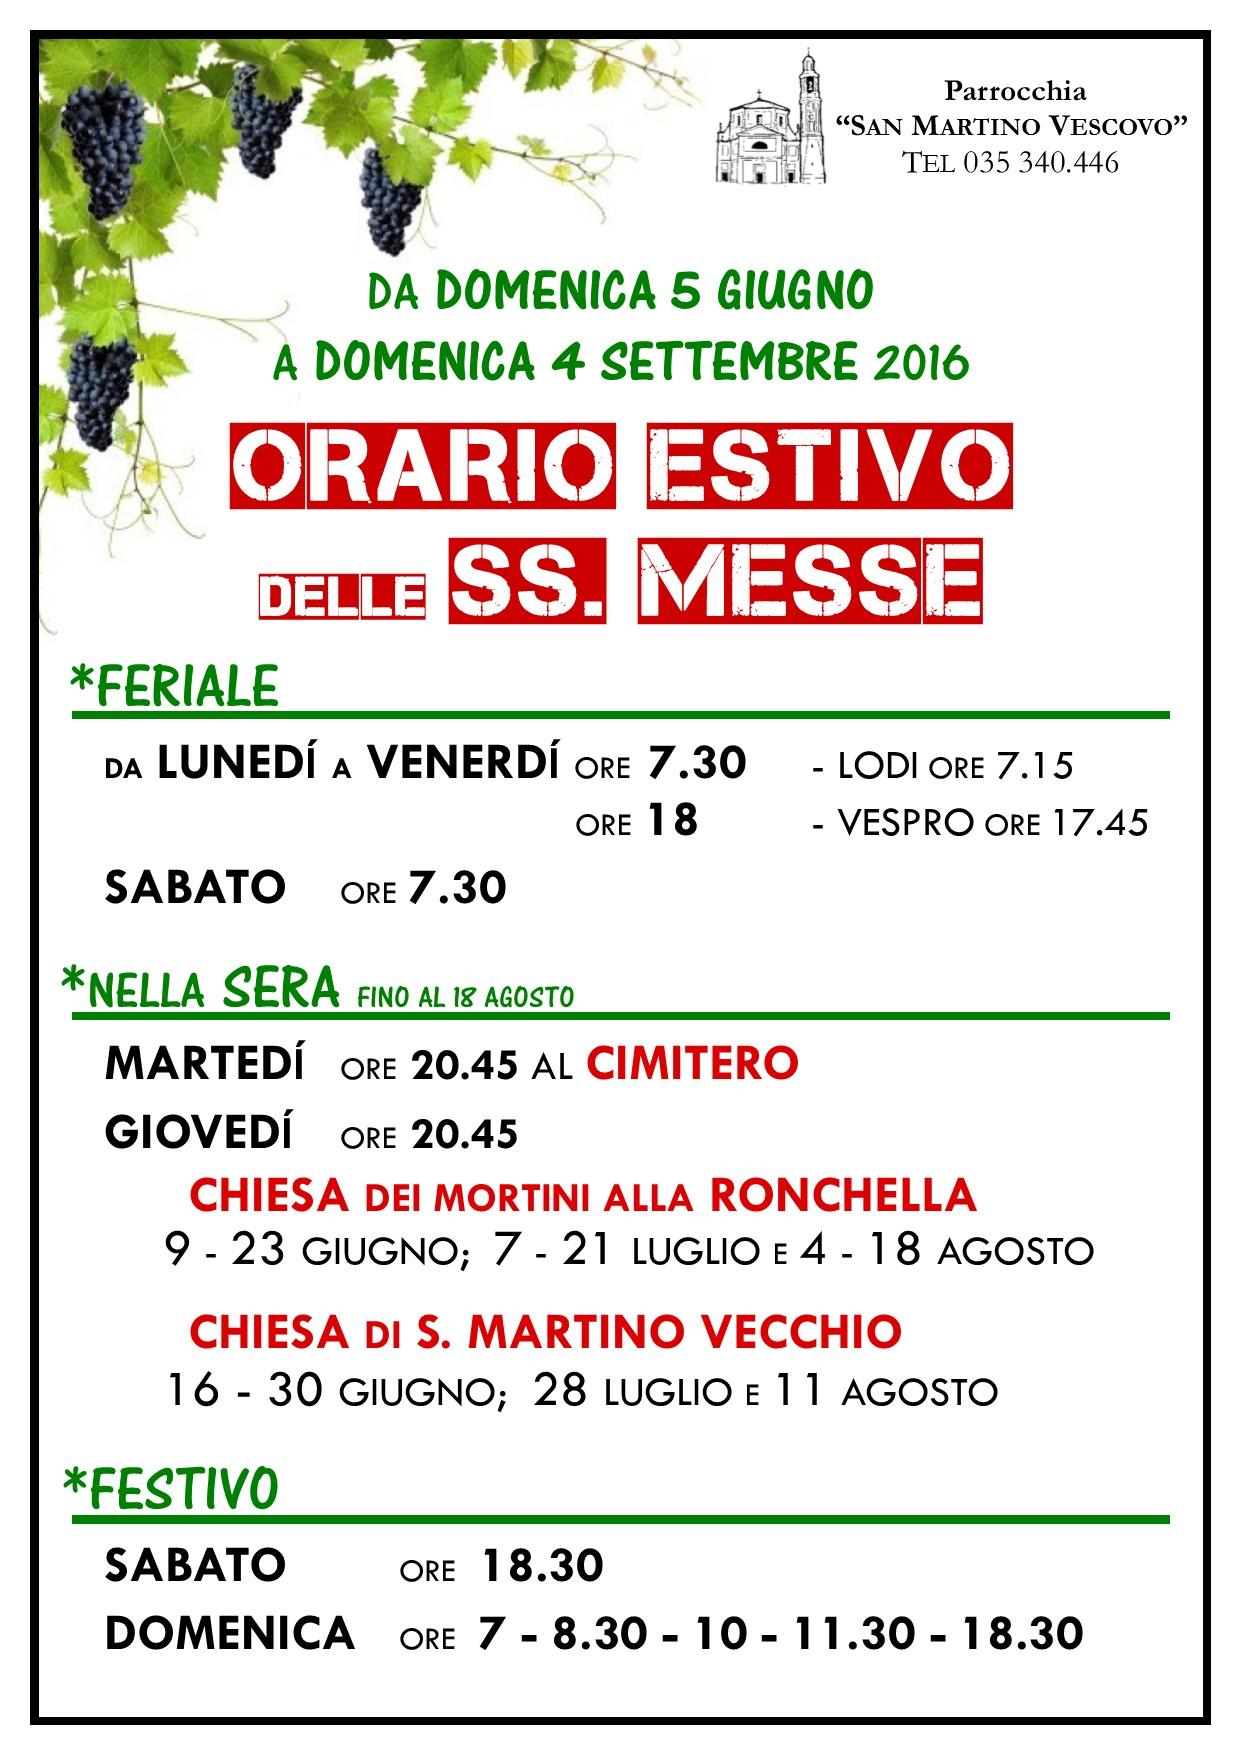 ORARIO ESTIVO MESSE 2016 P1